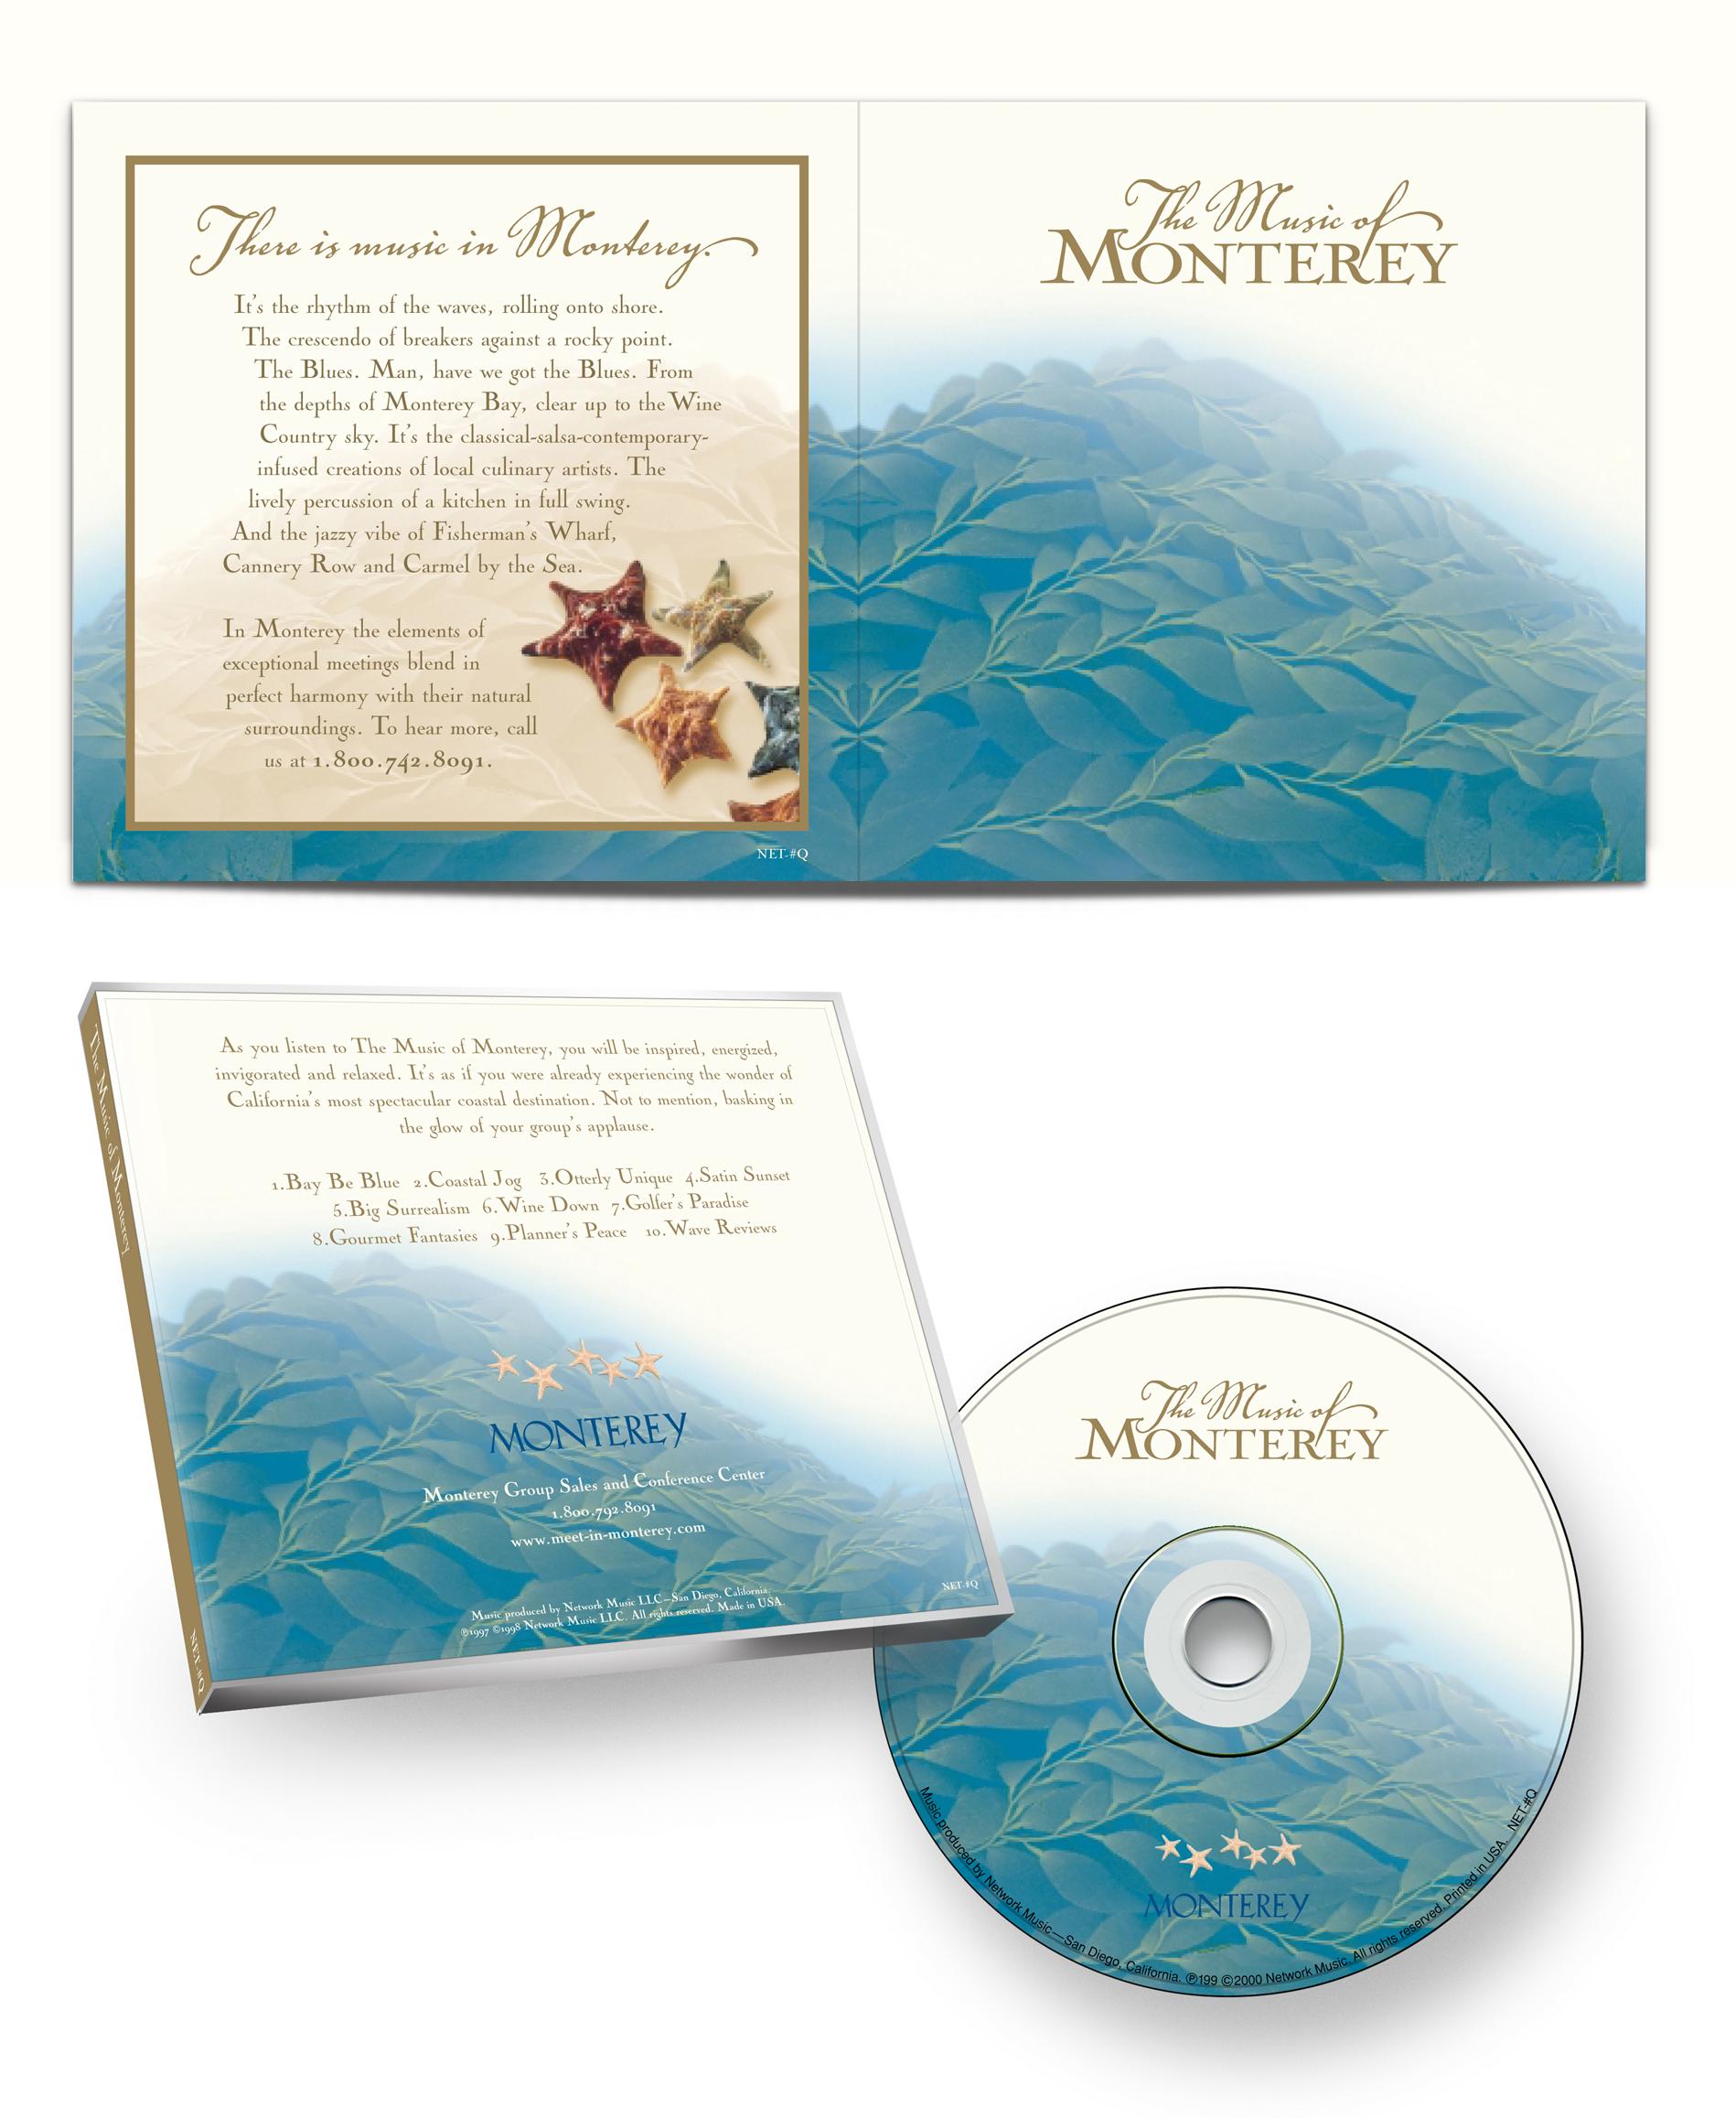 Promotional CD Case & Booklet